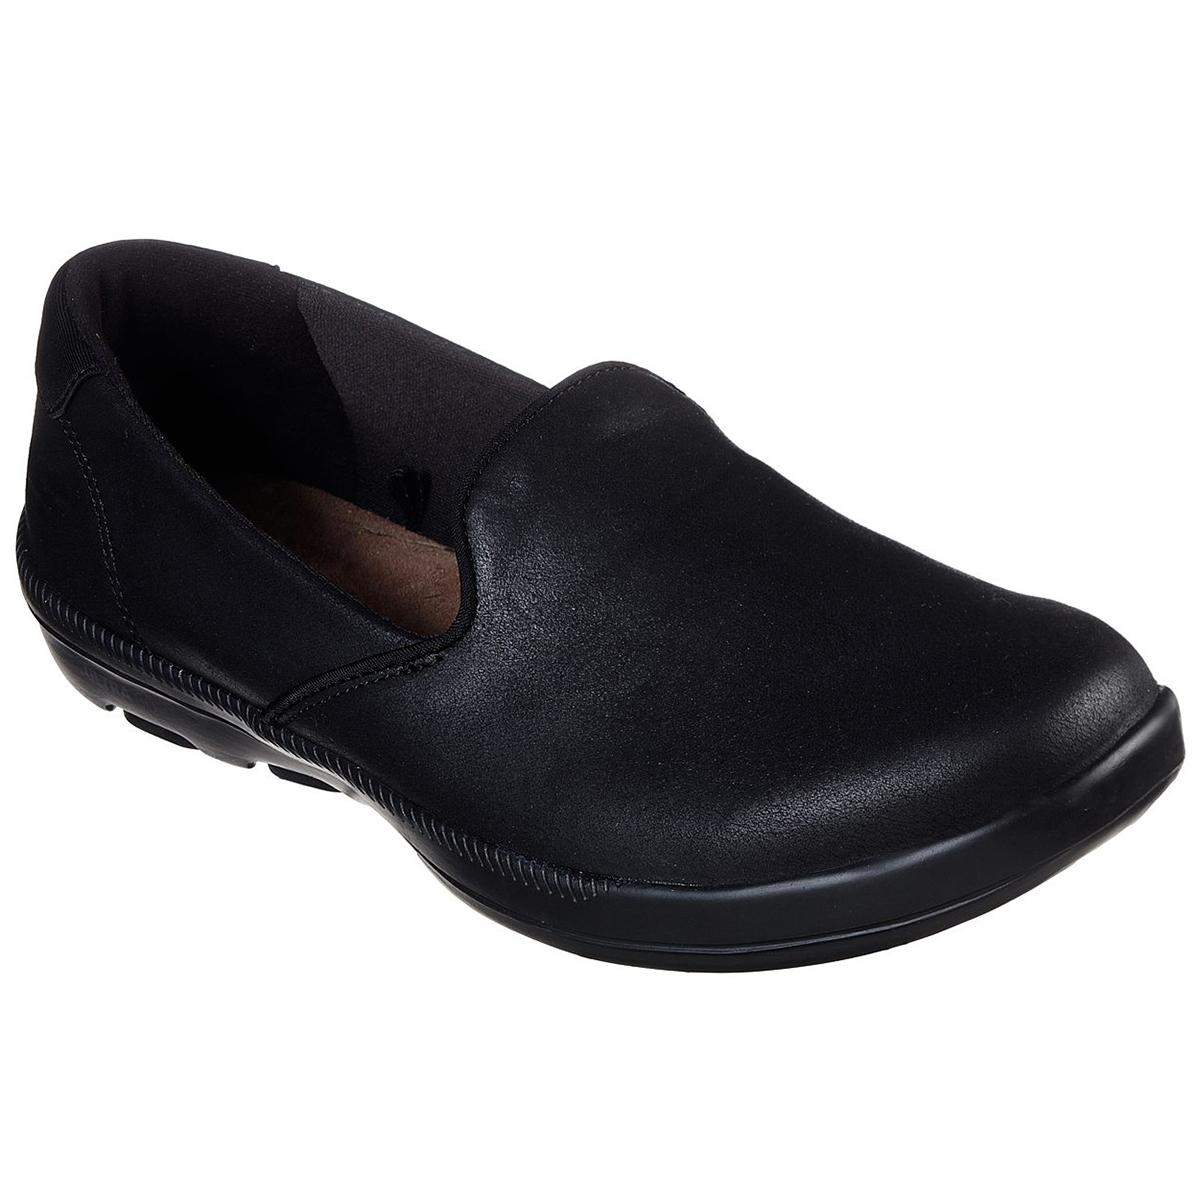 Skechers Women's On-The-Go Bliss Empress Shoes - Black, 6.5